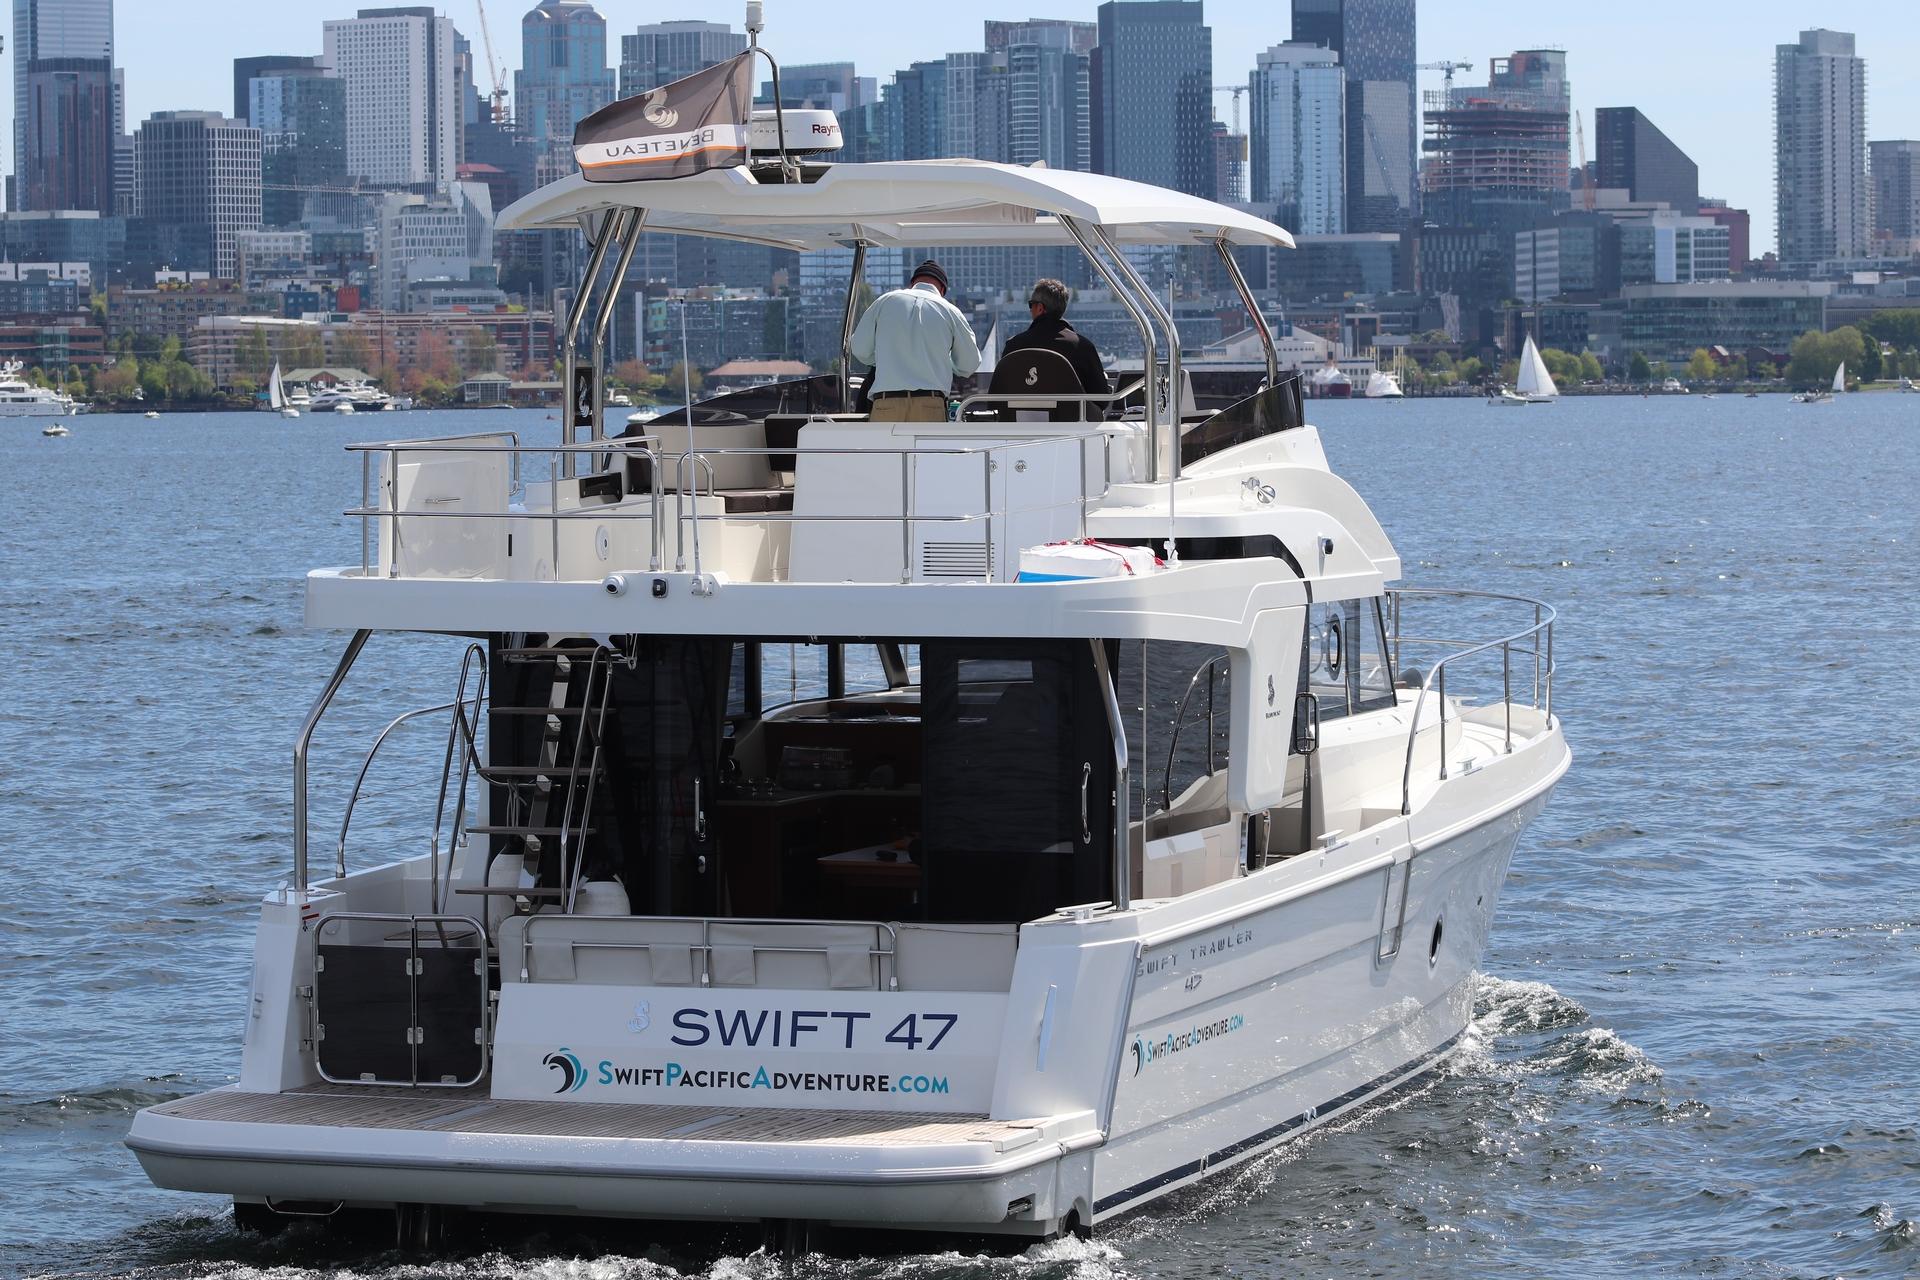 Beneteau Swift Pacific Adventure | Event One